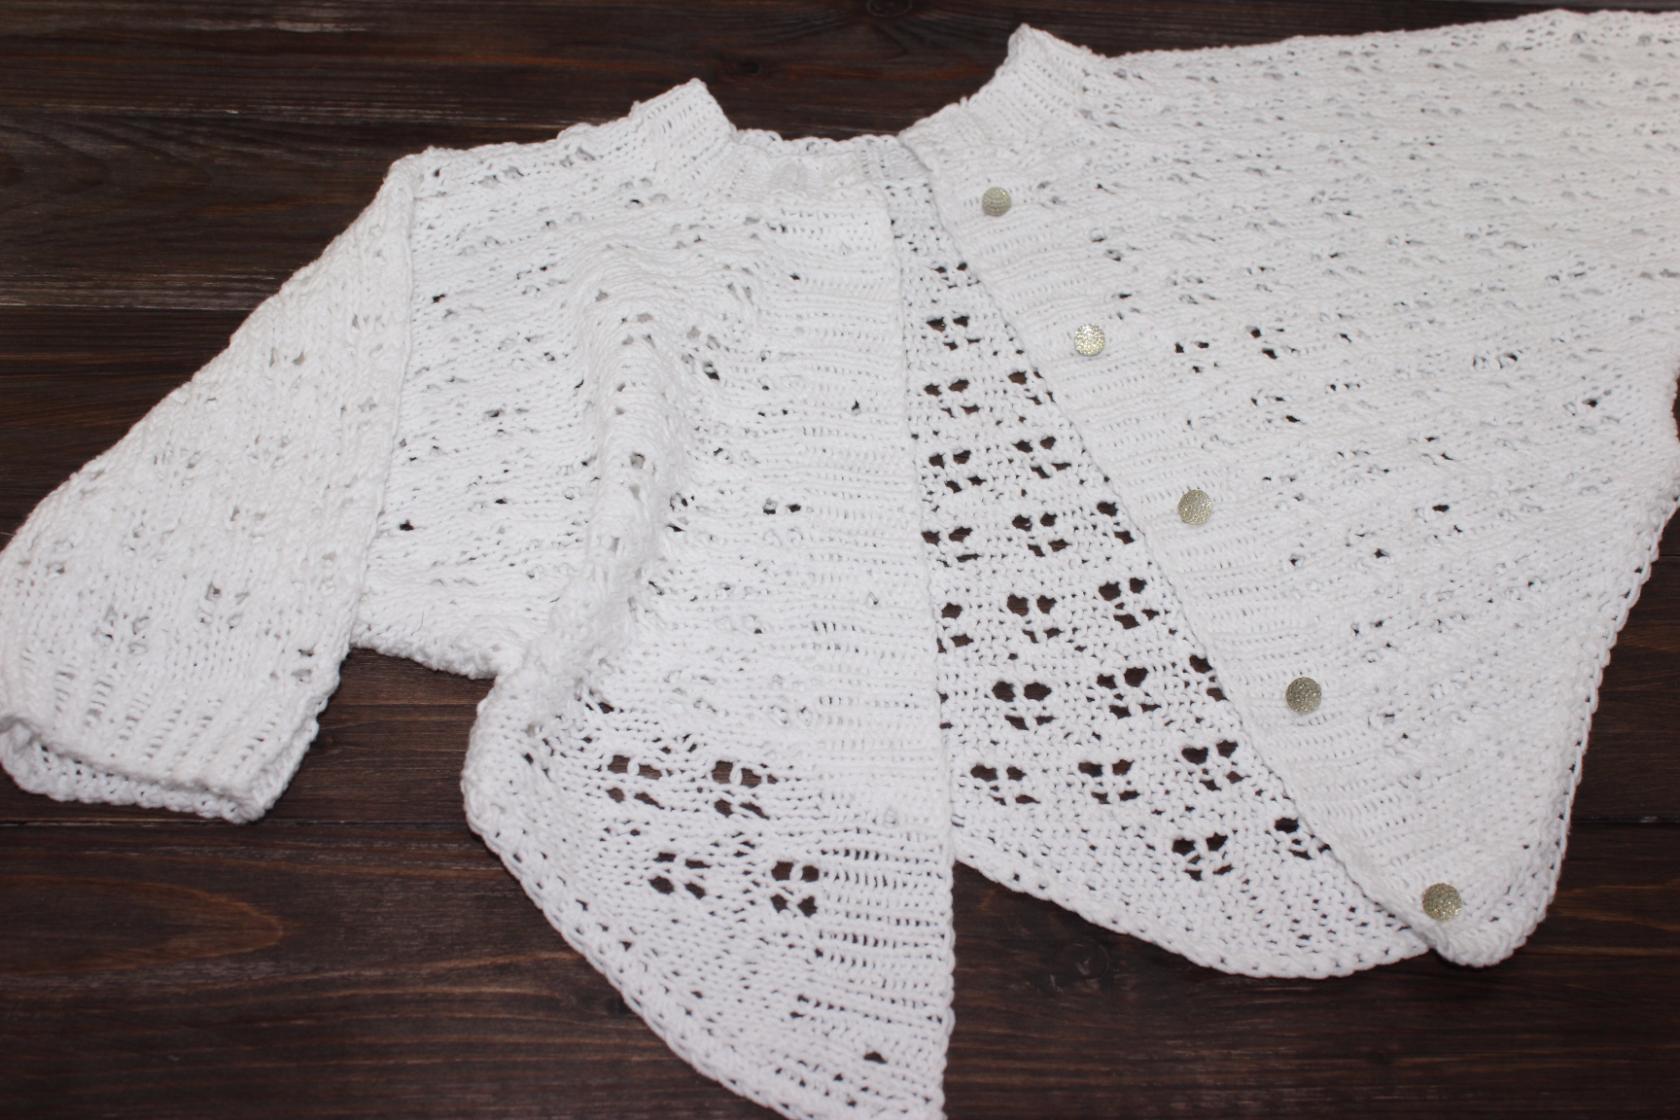 ажурная кофта для девочки вязаная спицами